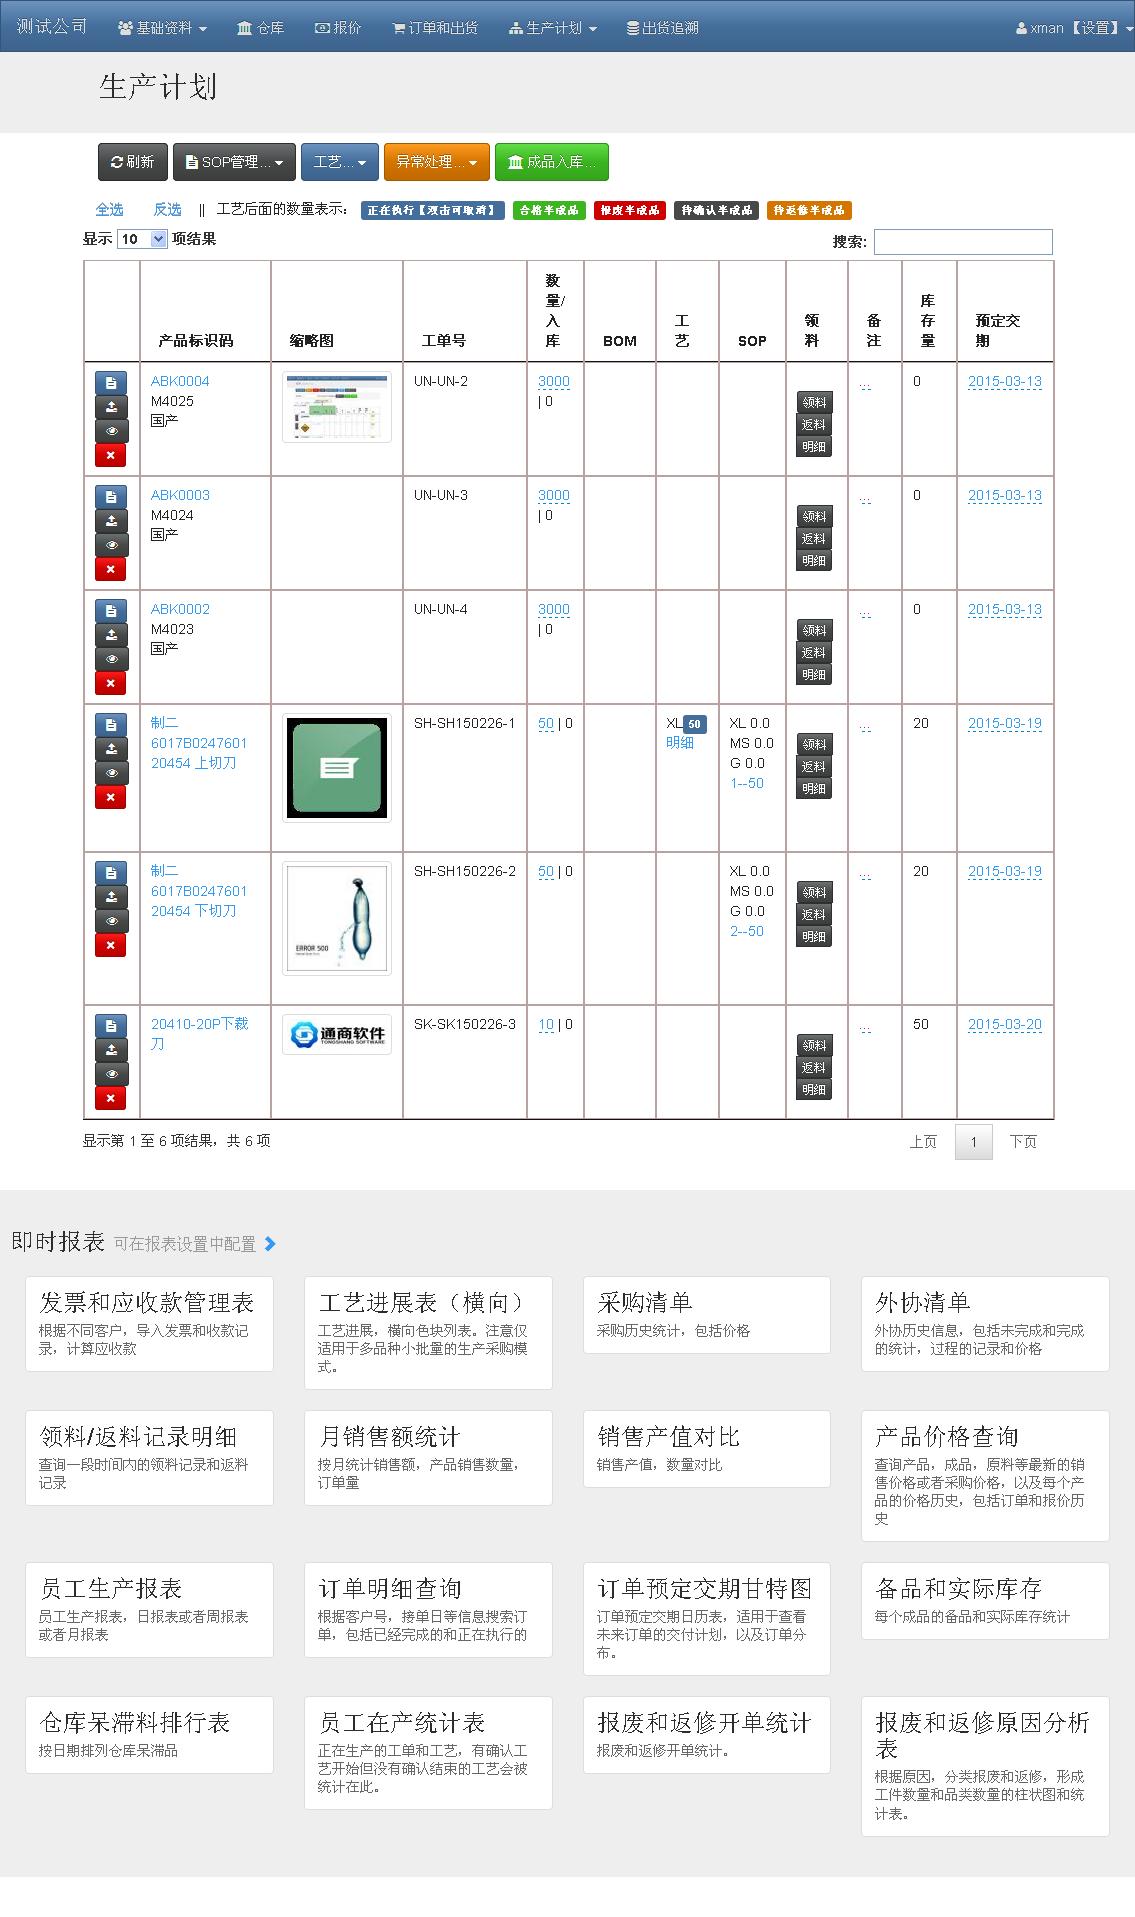 FireShot Screen Capture 008 %E9%80%9F%E6%98%93%E5%A4%A9%E5%B7%A5 4 2 1 erp 6erp cn erp page production - ERP/MES -- 标准产品生产企业应用案例